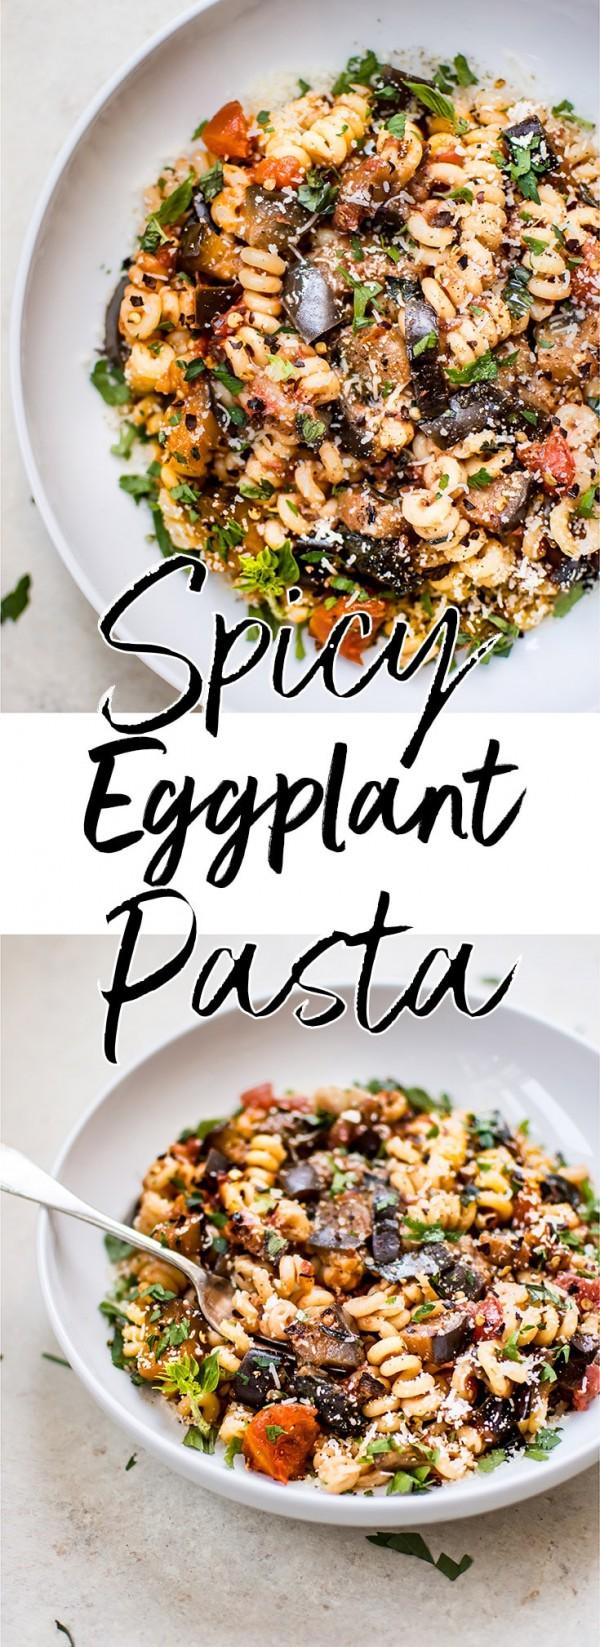 Get the recipe Spicy Eggplant Pasta @recipes_to_go